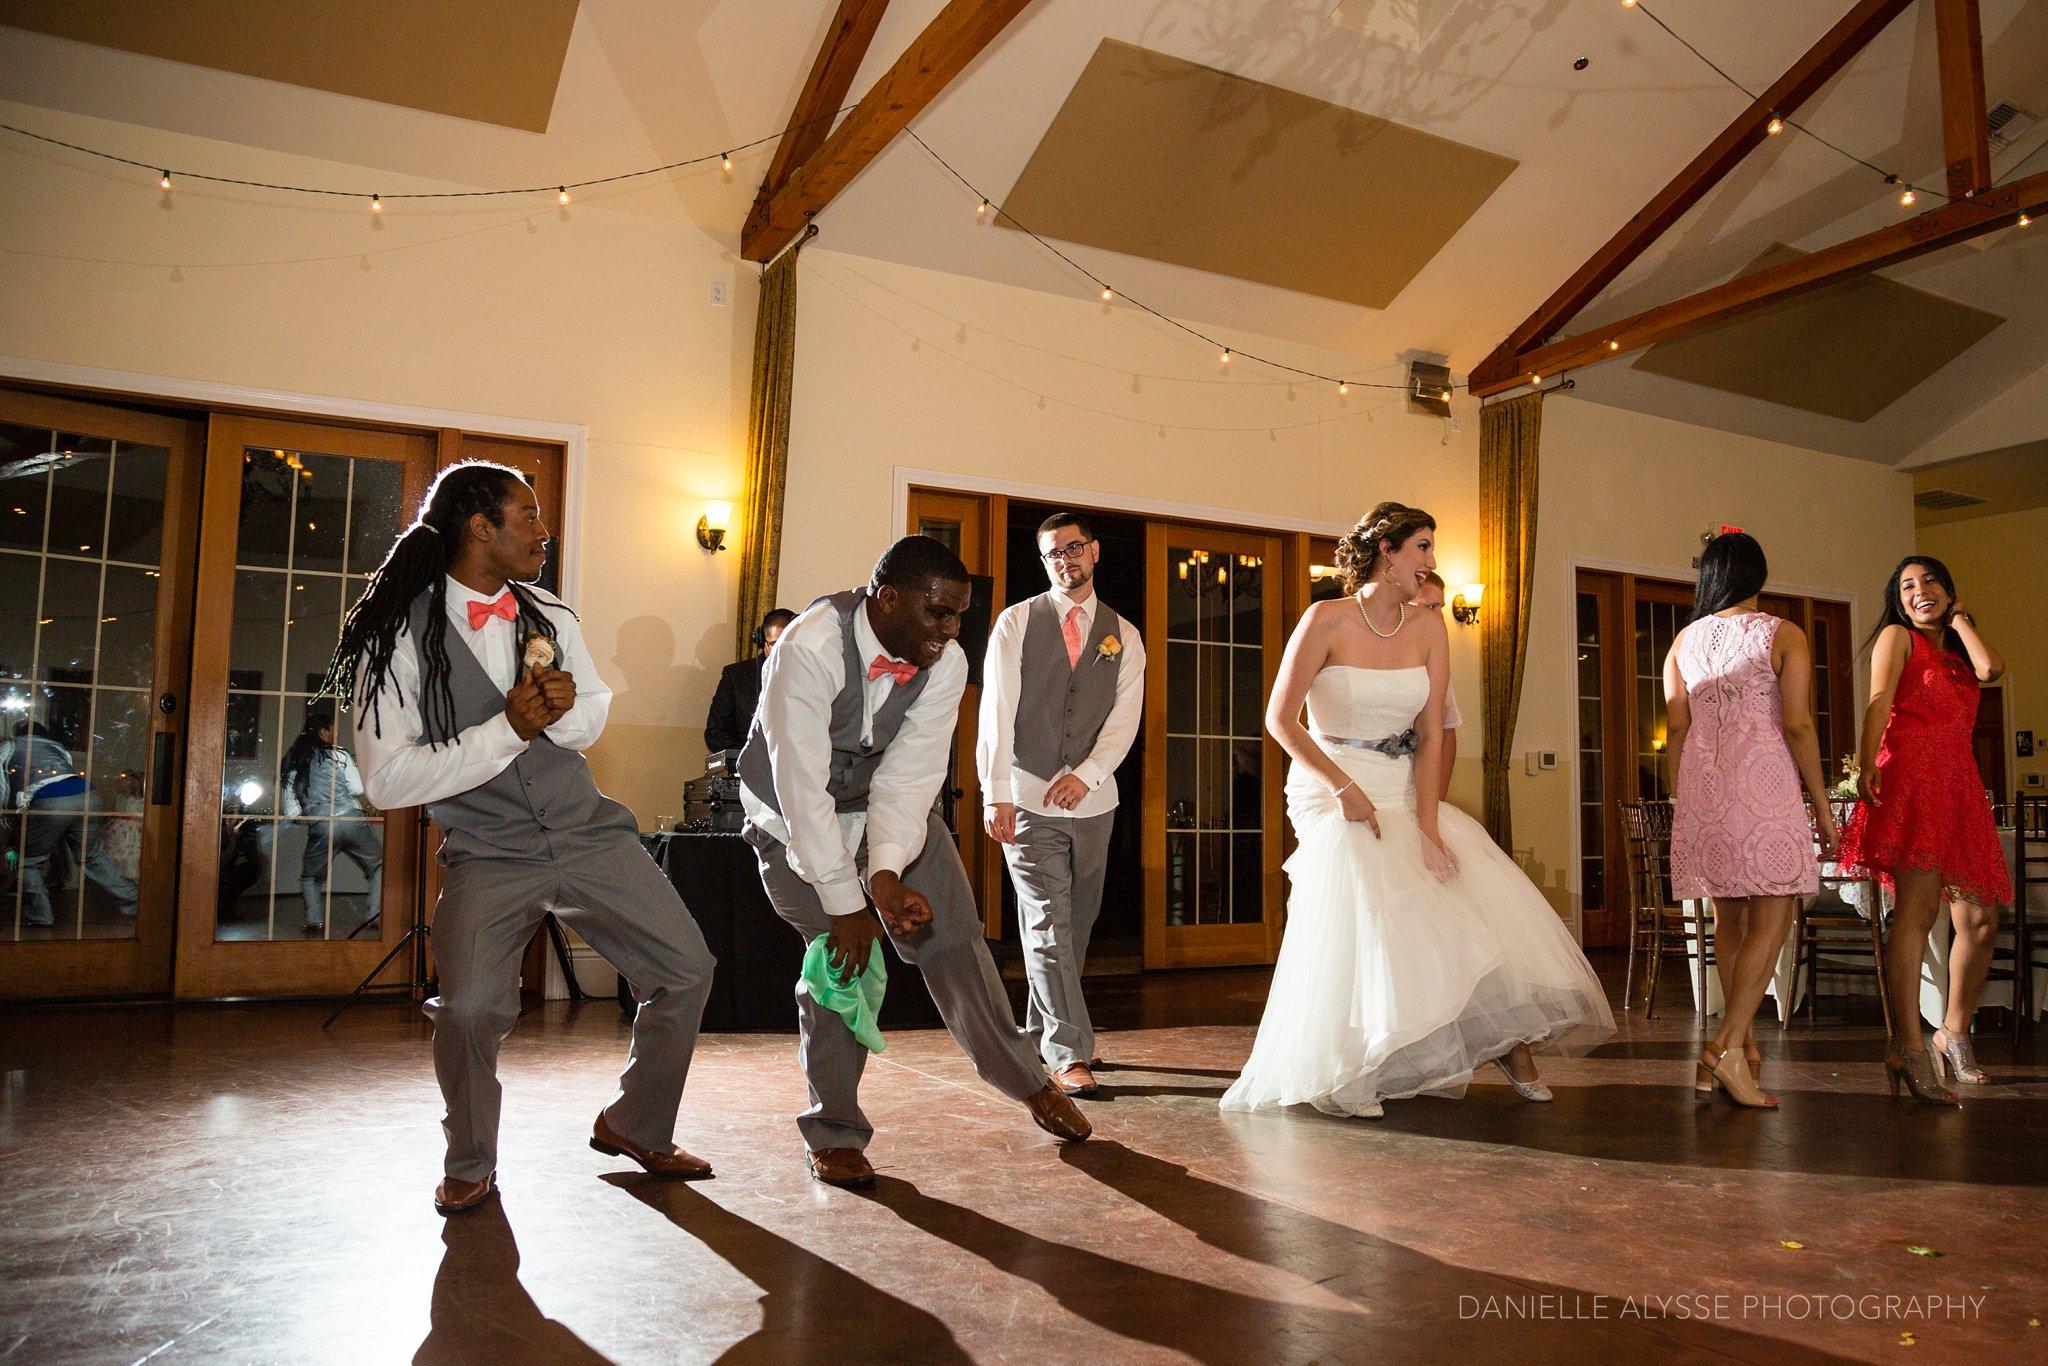 170507_blog_megan_david_wedding_loomis_flower_farm_inn_danielle_alysse_photography_sacramento_photographer0596_WEB.jpg